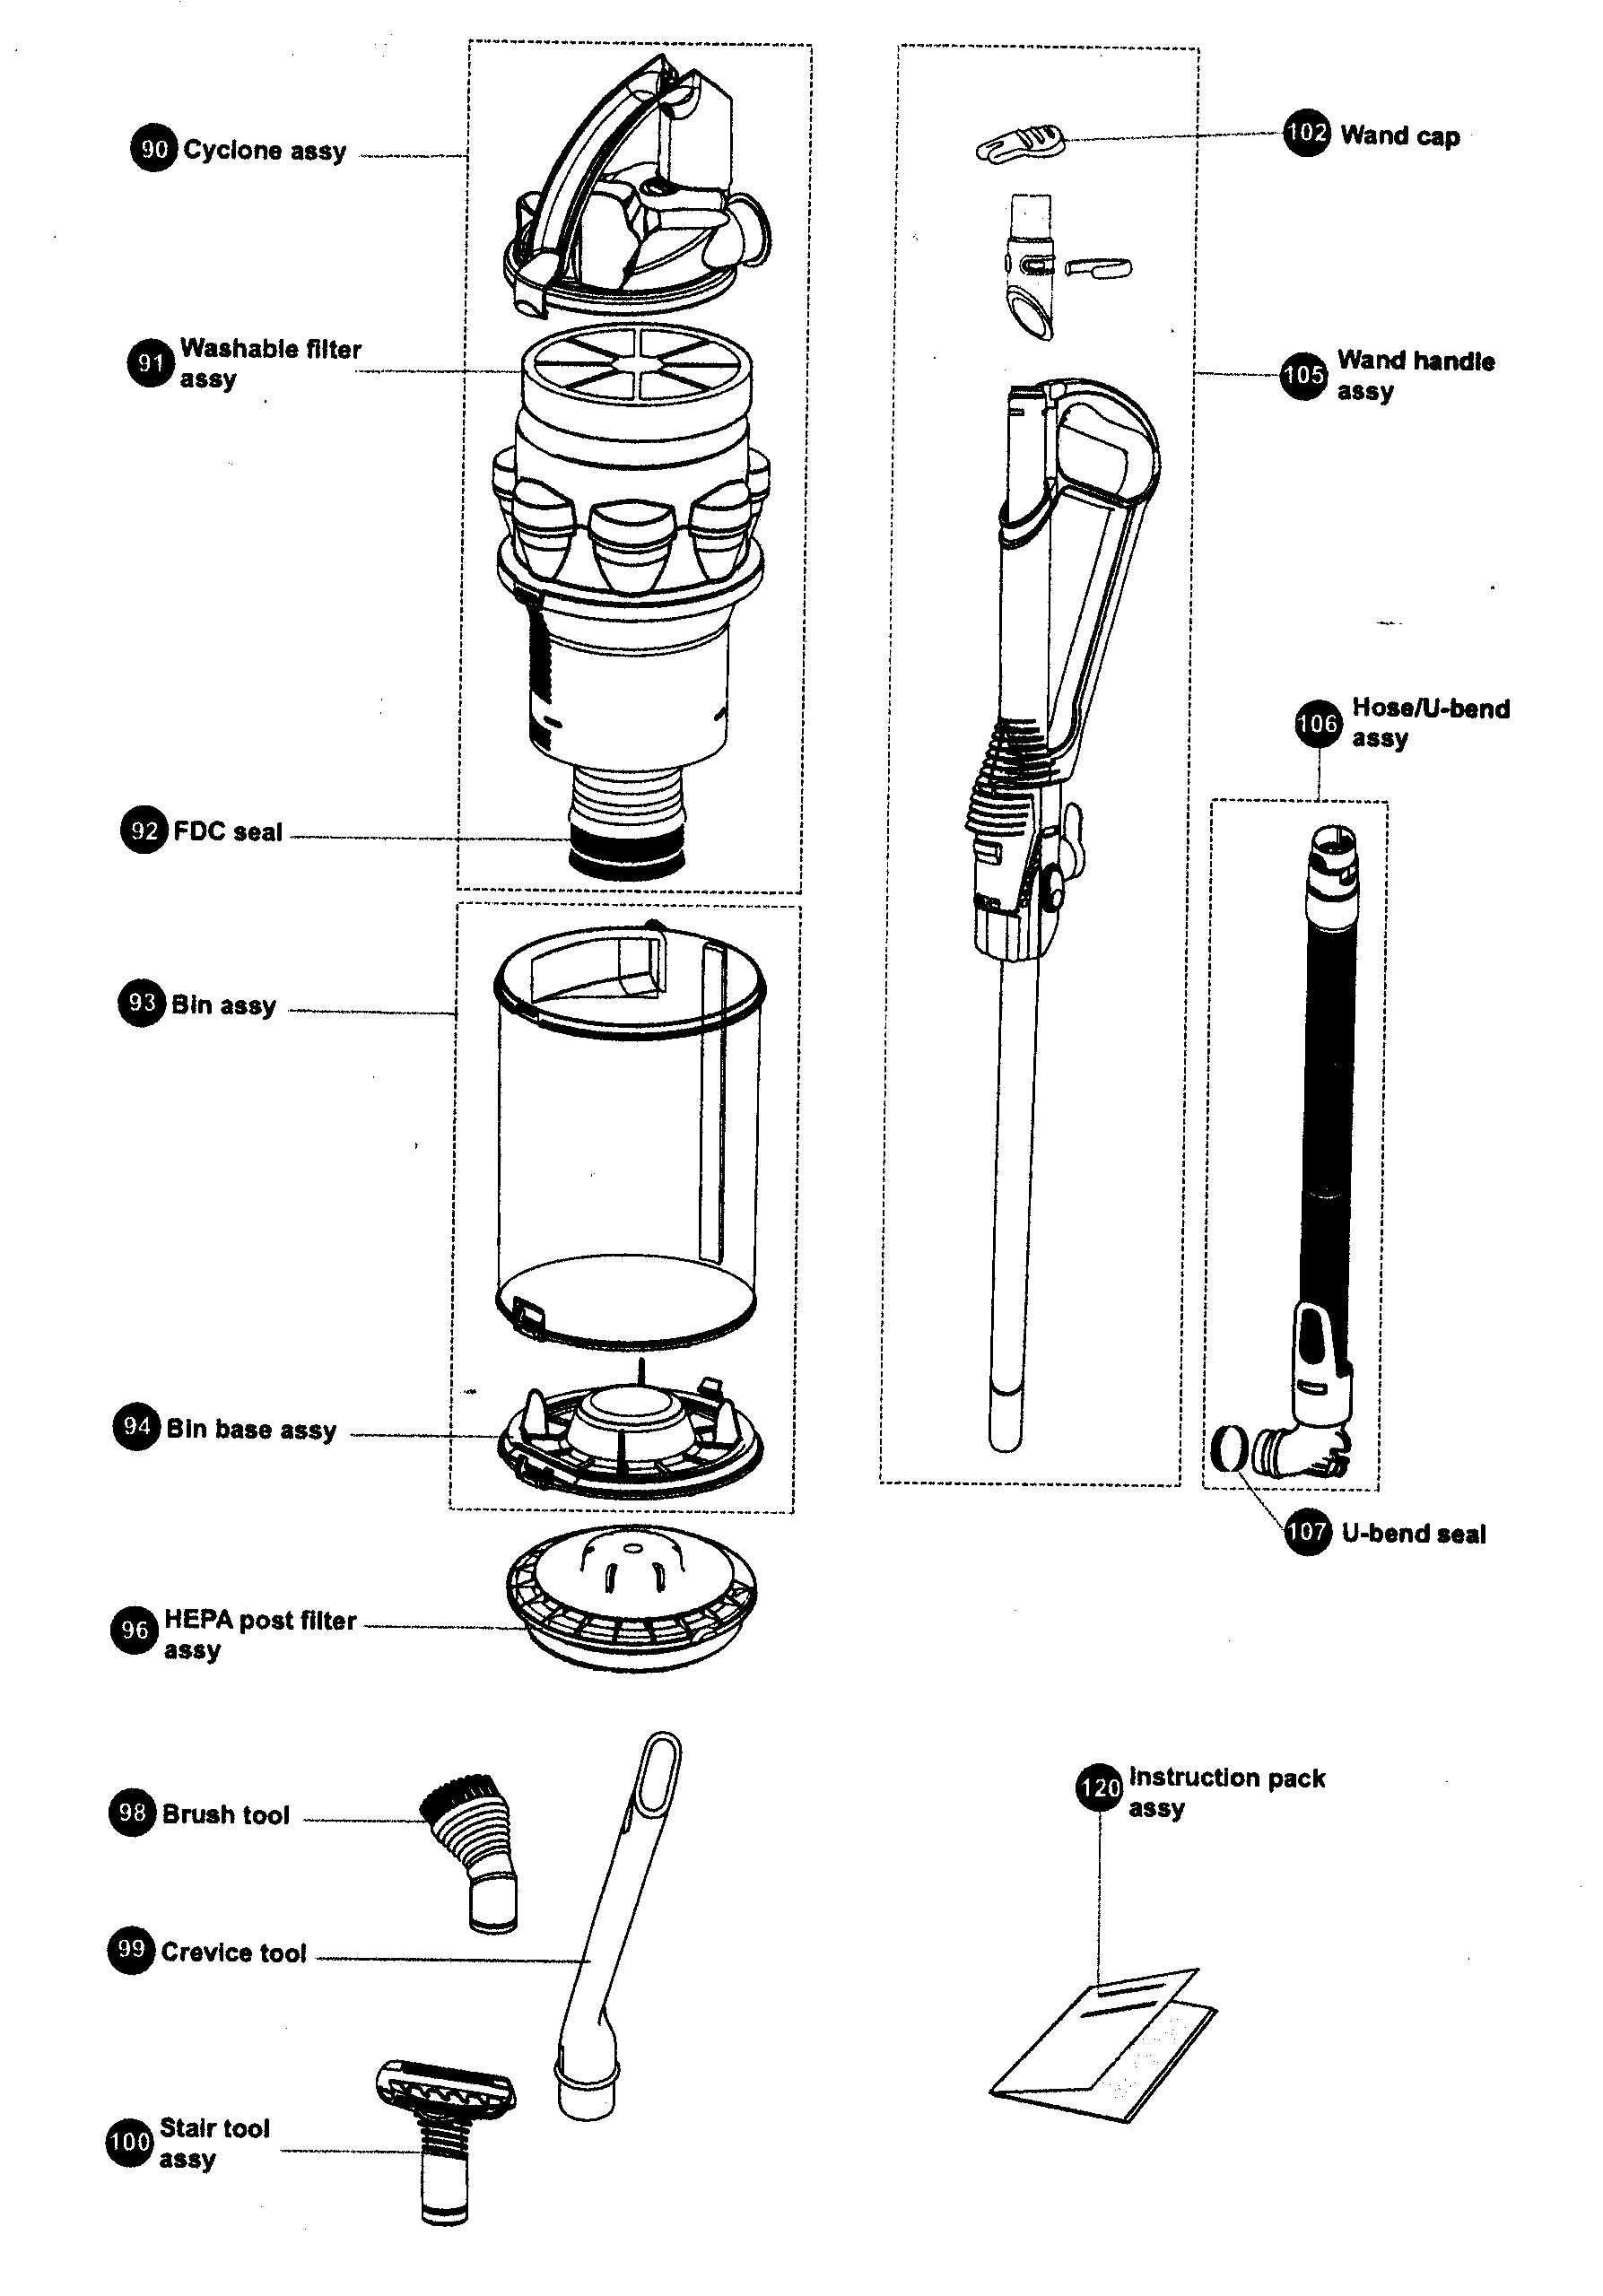 Dyson Vacuum Cleaner Wiring Diagram - Wiring Diagram NL